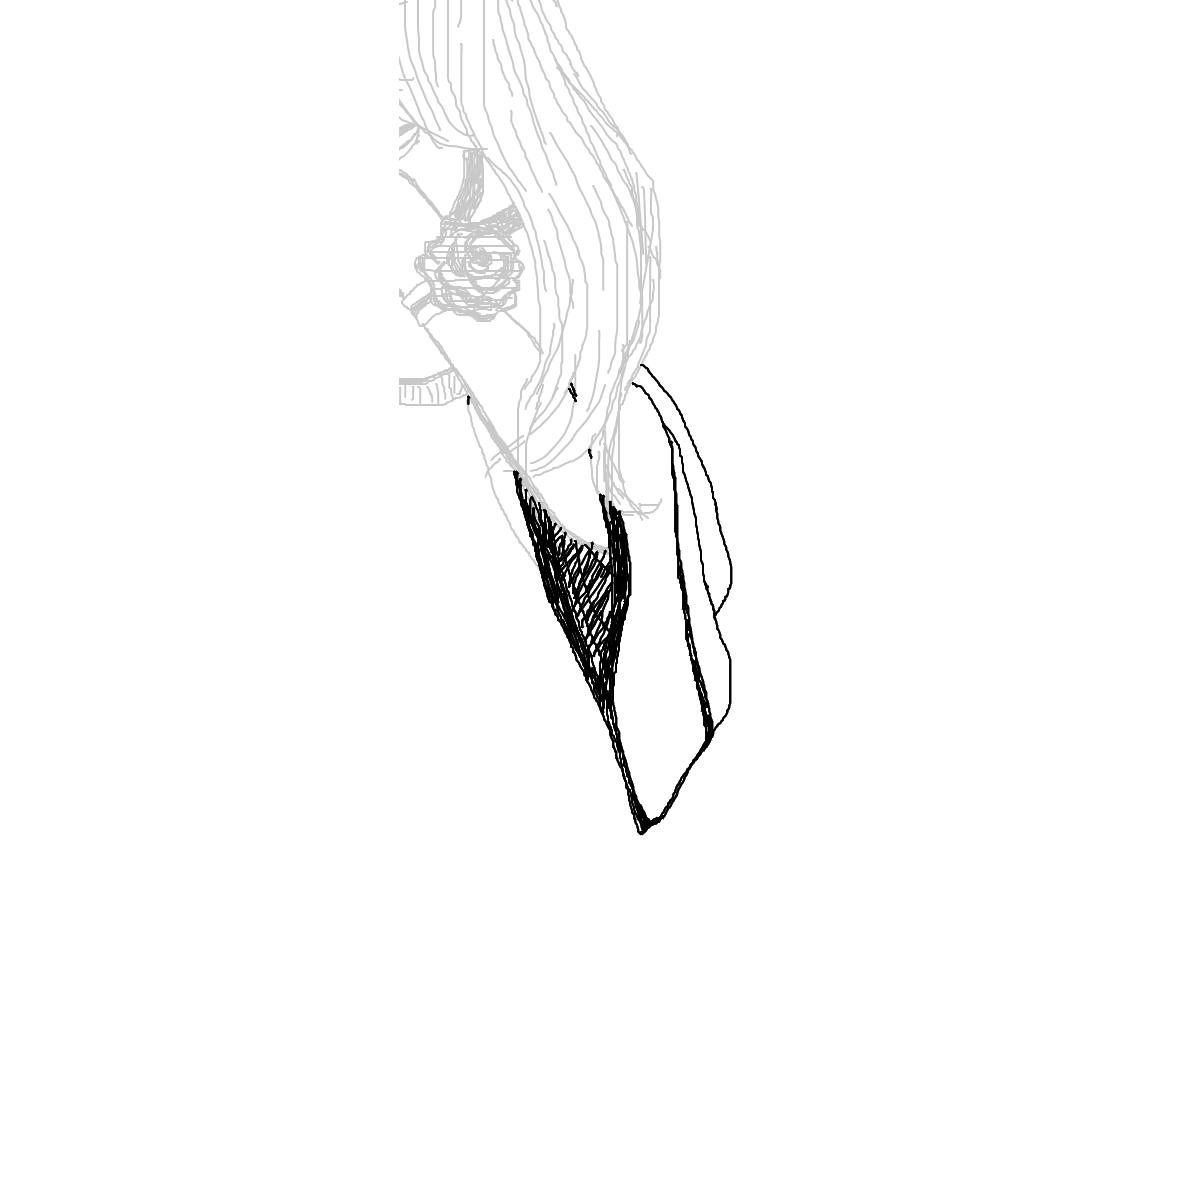 BAAAM drawing#23446 lat:45.7347450256347660lng: 4.9029150009155270